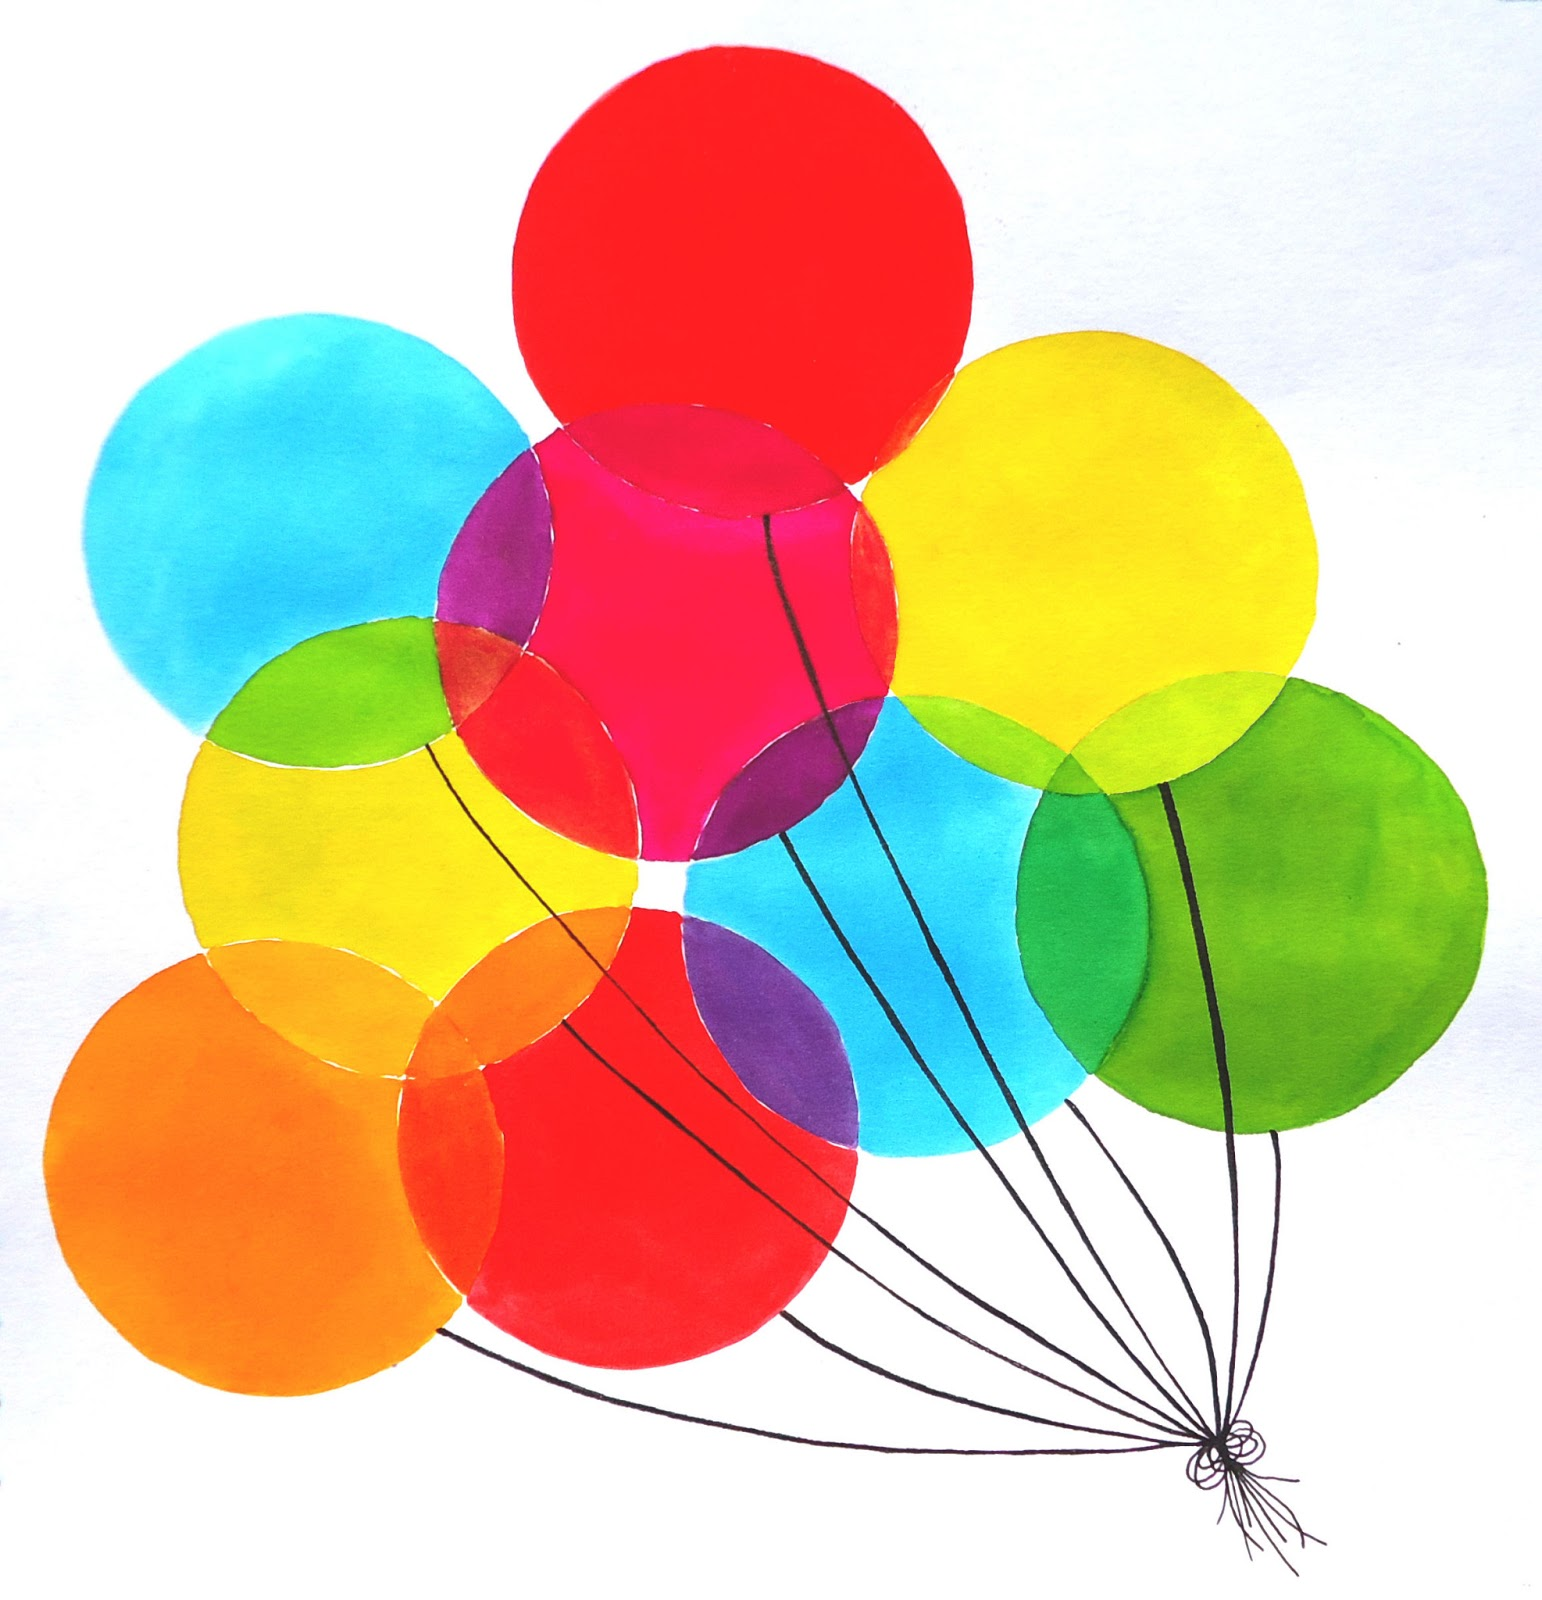 balloon drawing tumblr - photo #31